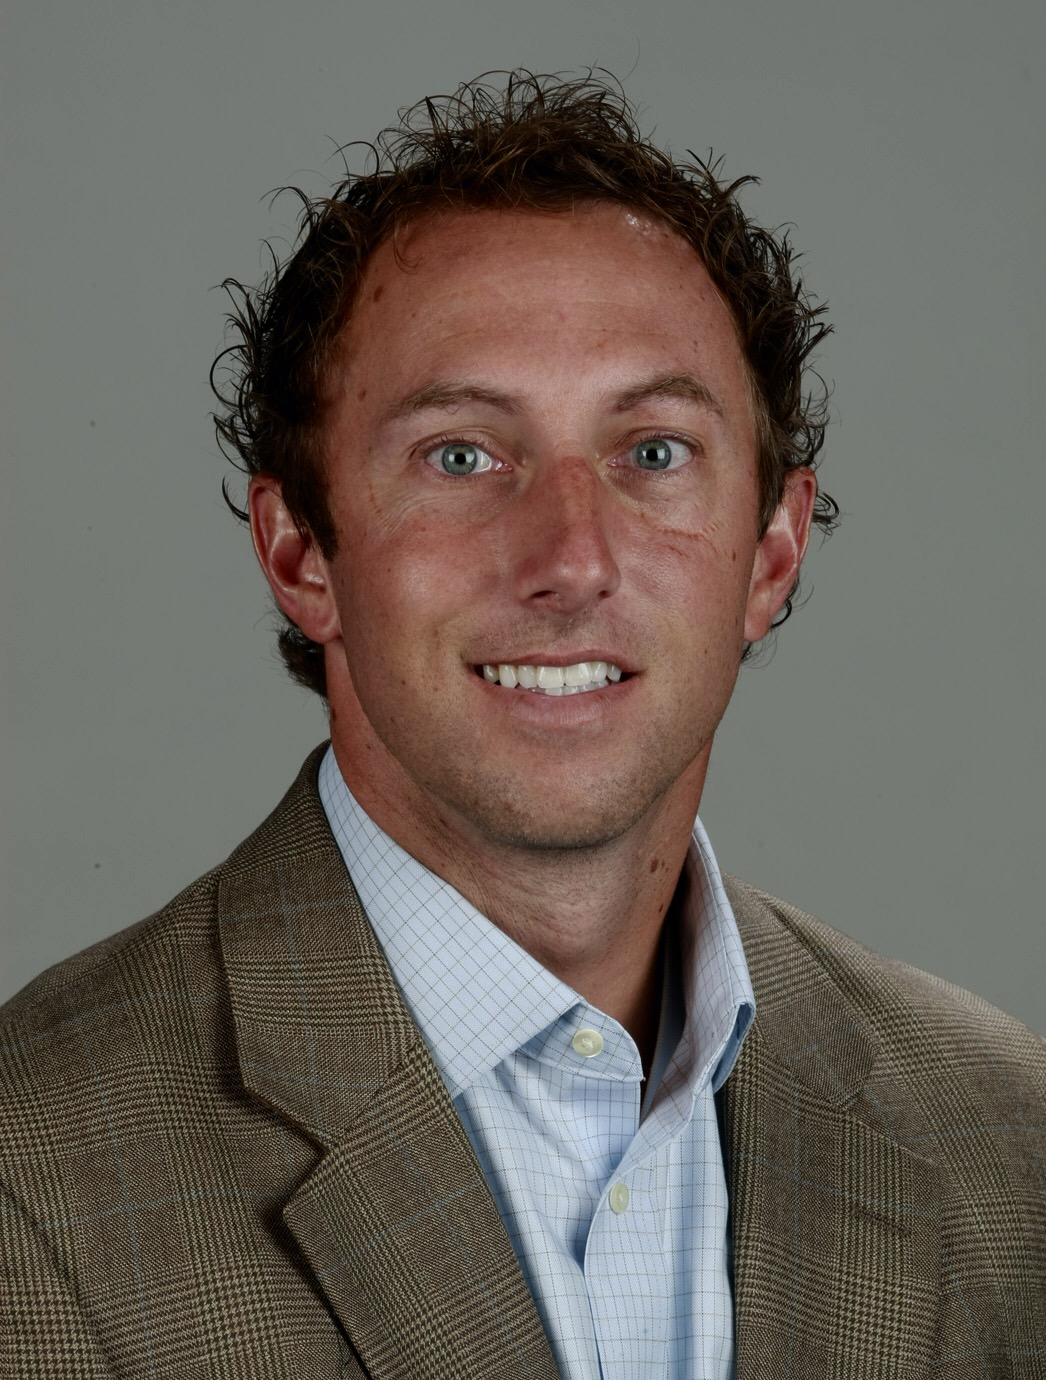 Eric Kammeyer